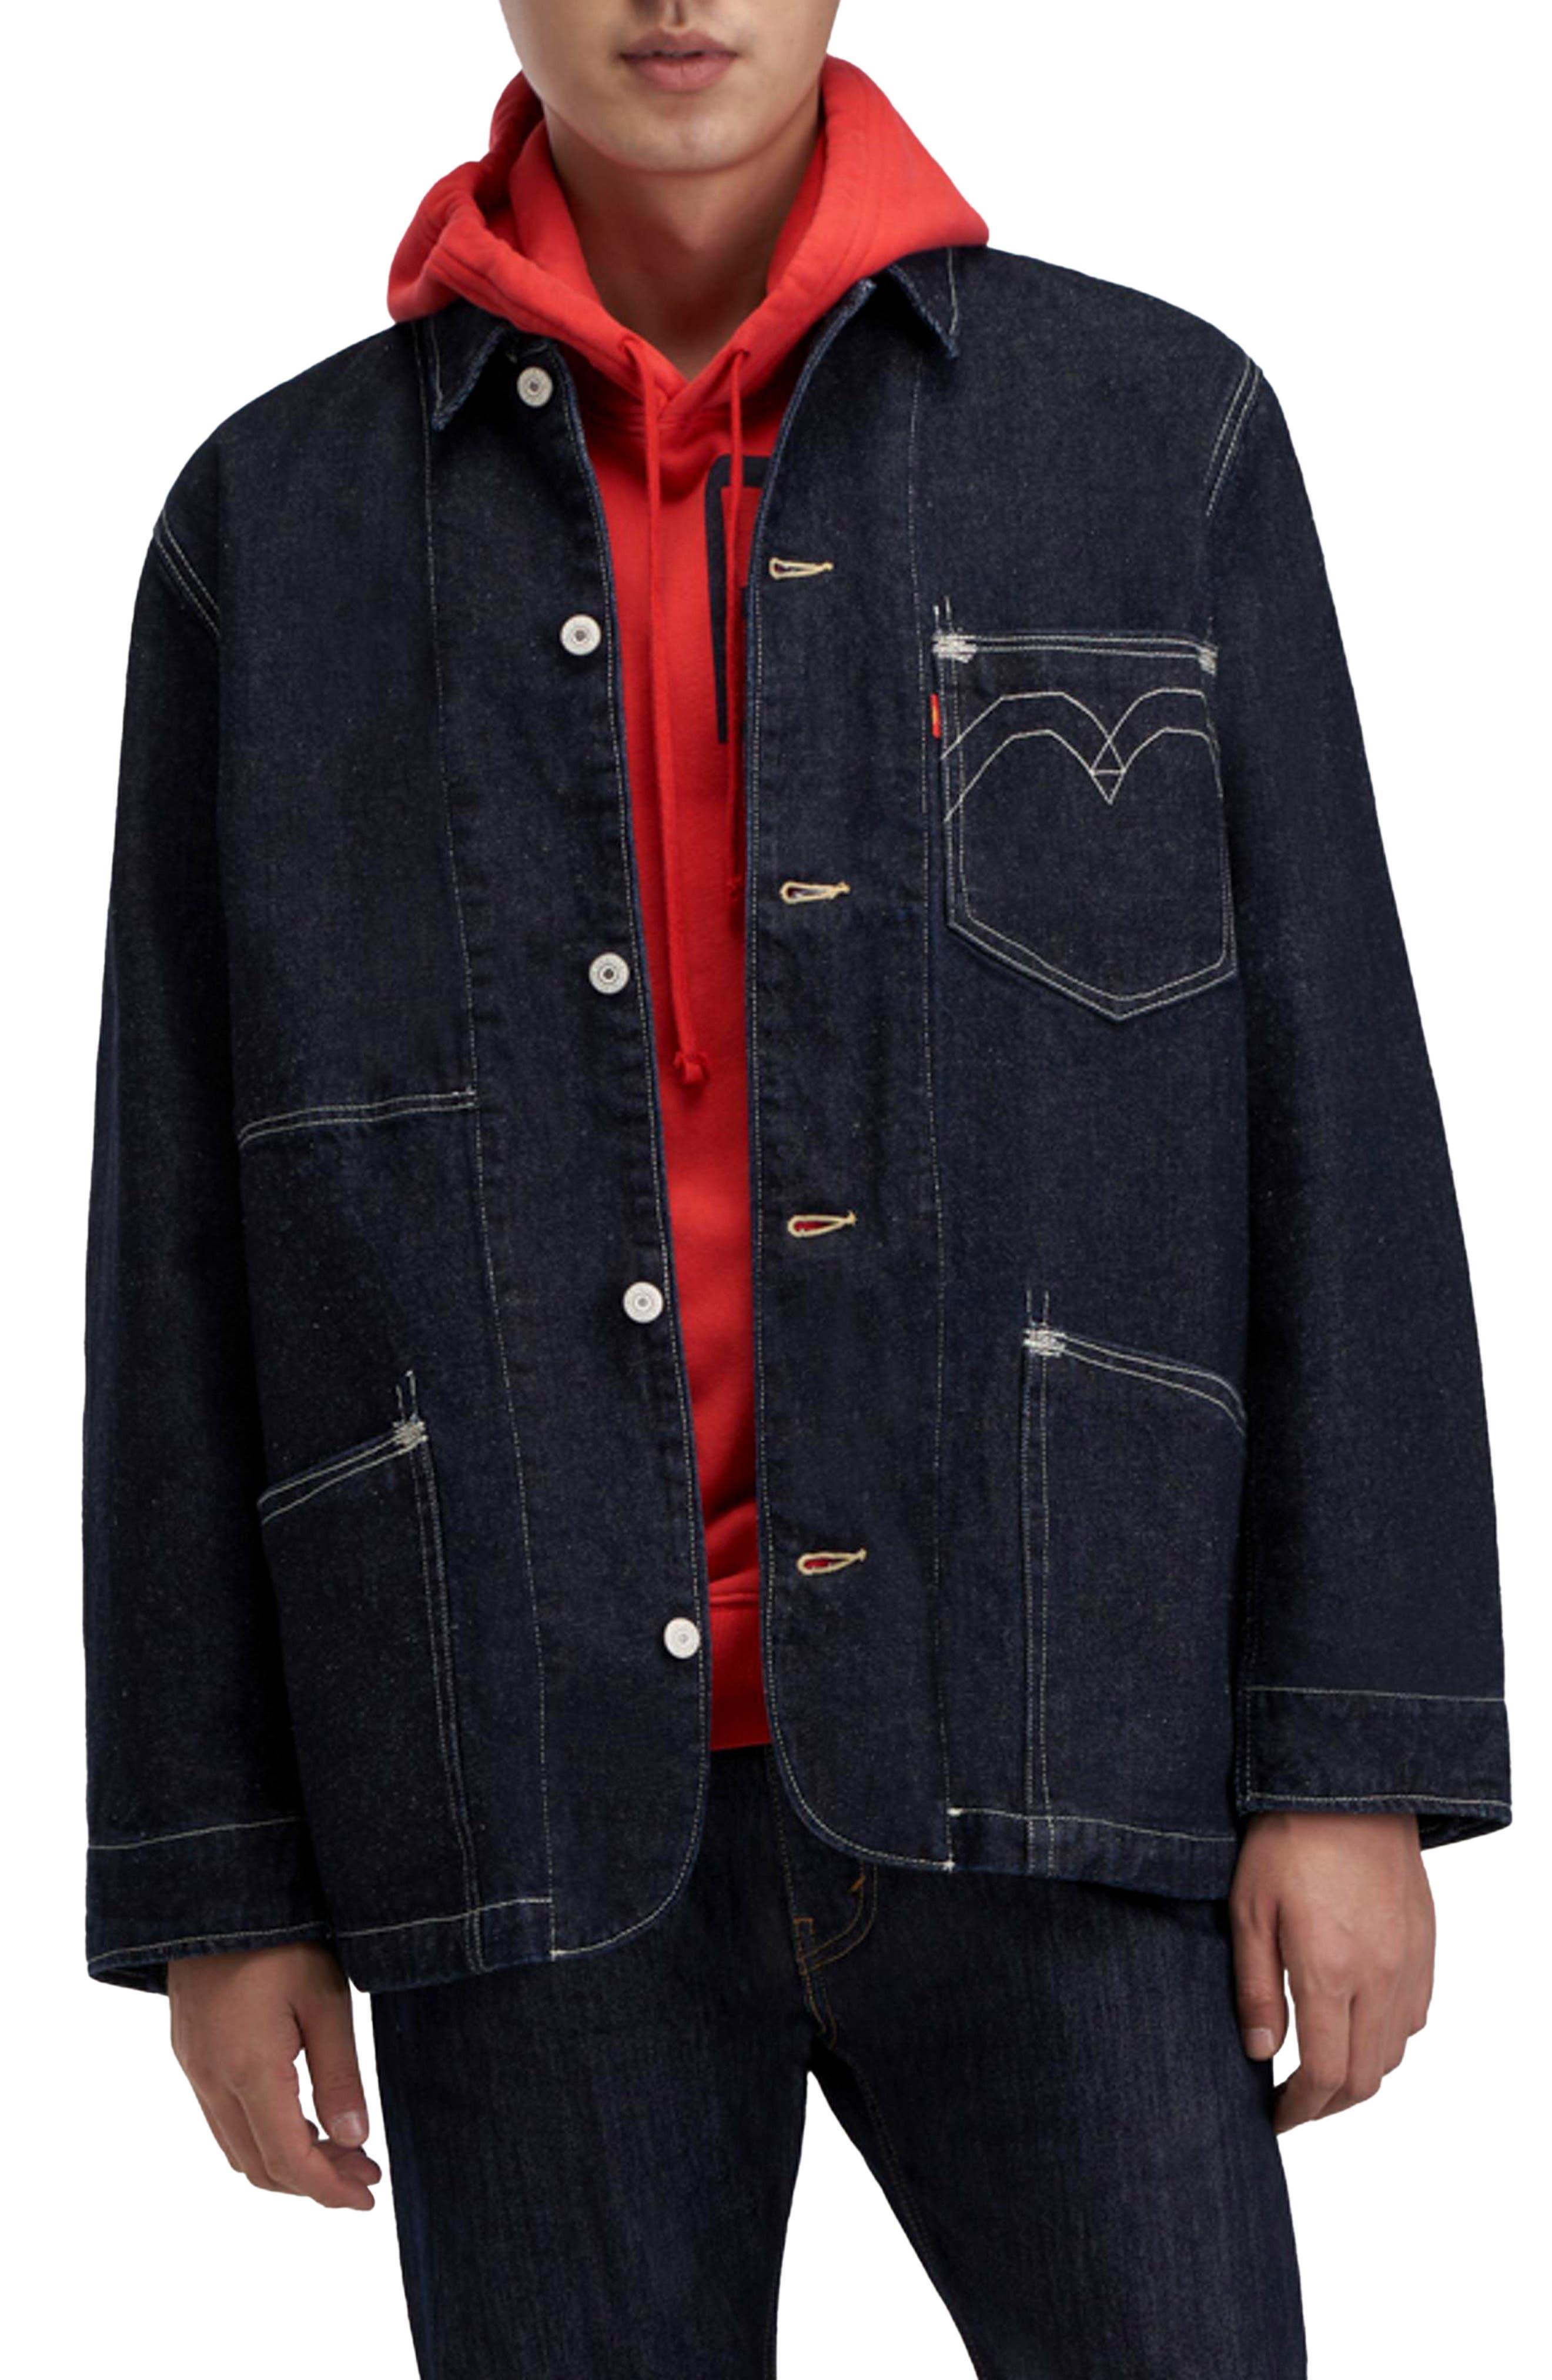 1900s Edwardian Men's Suits and Coats Mens Levis Red Label Engineered Cotton  Hemp Denim Jacket Size Small - Blue $130.00 AT vintagedancer.com